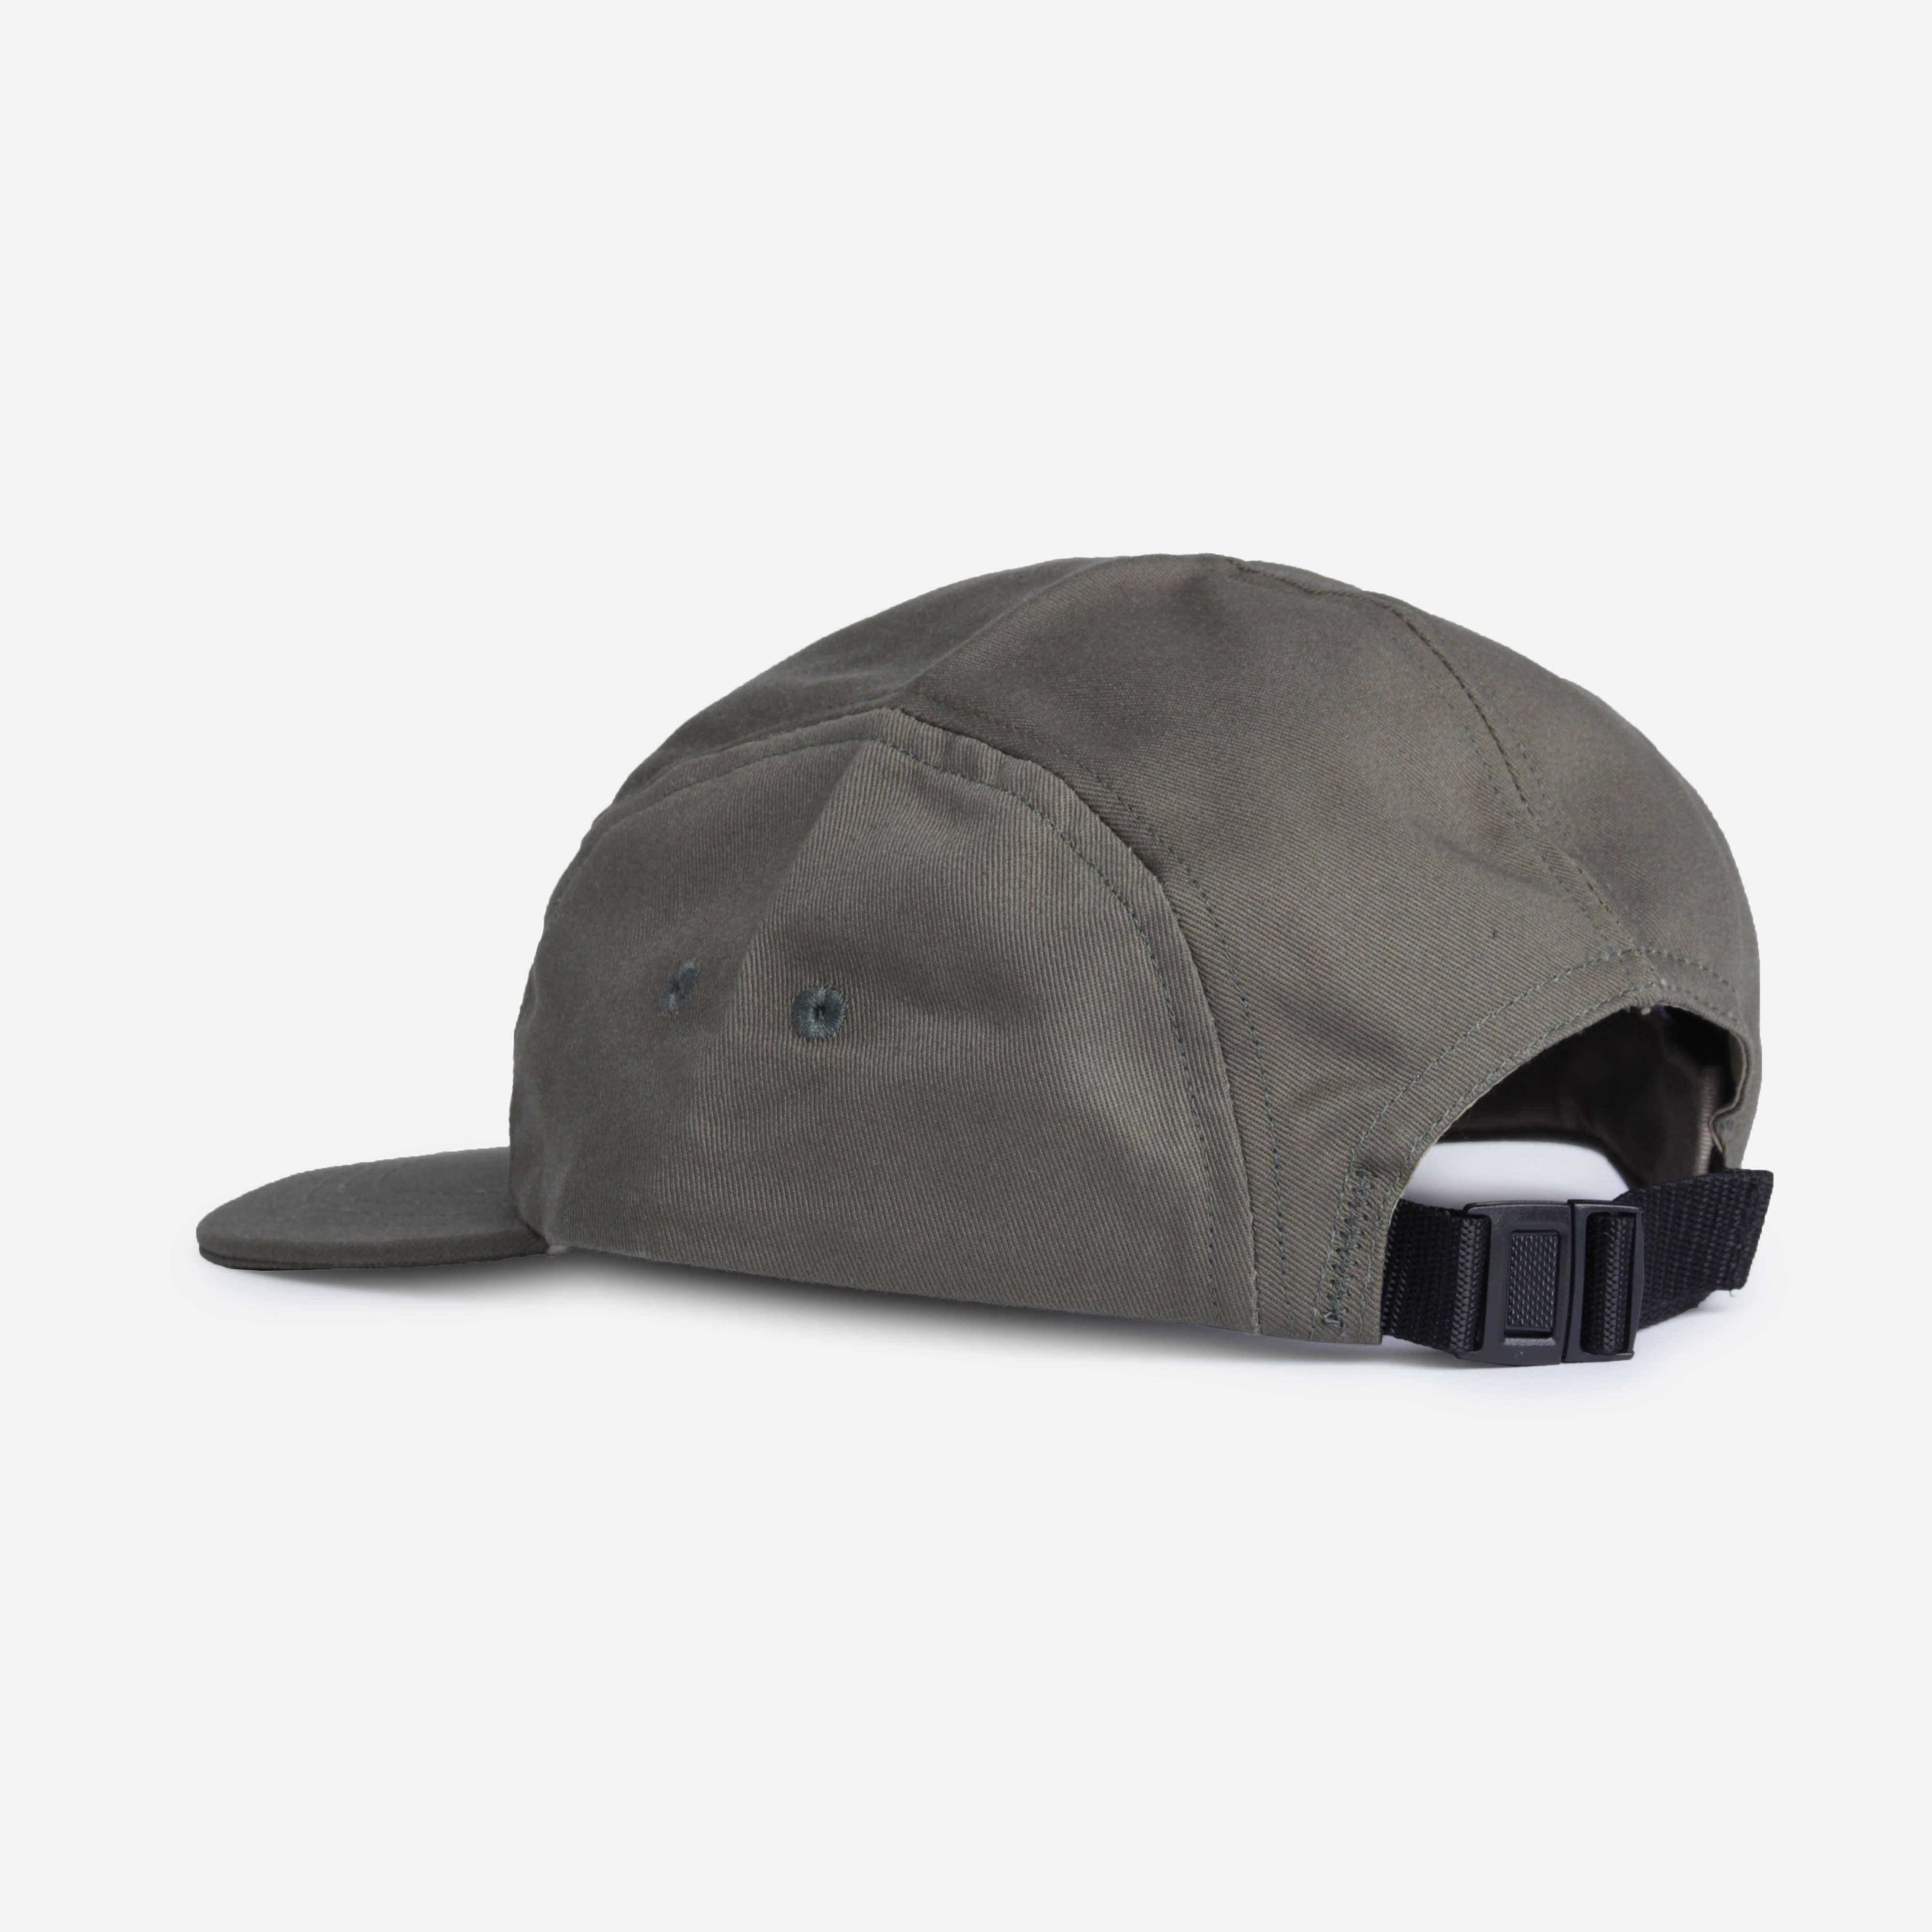 Battenwear Travel Cap